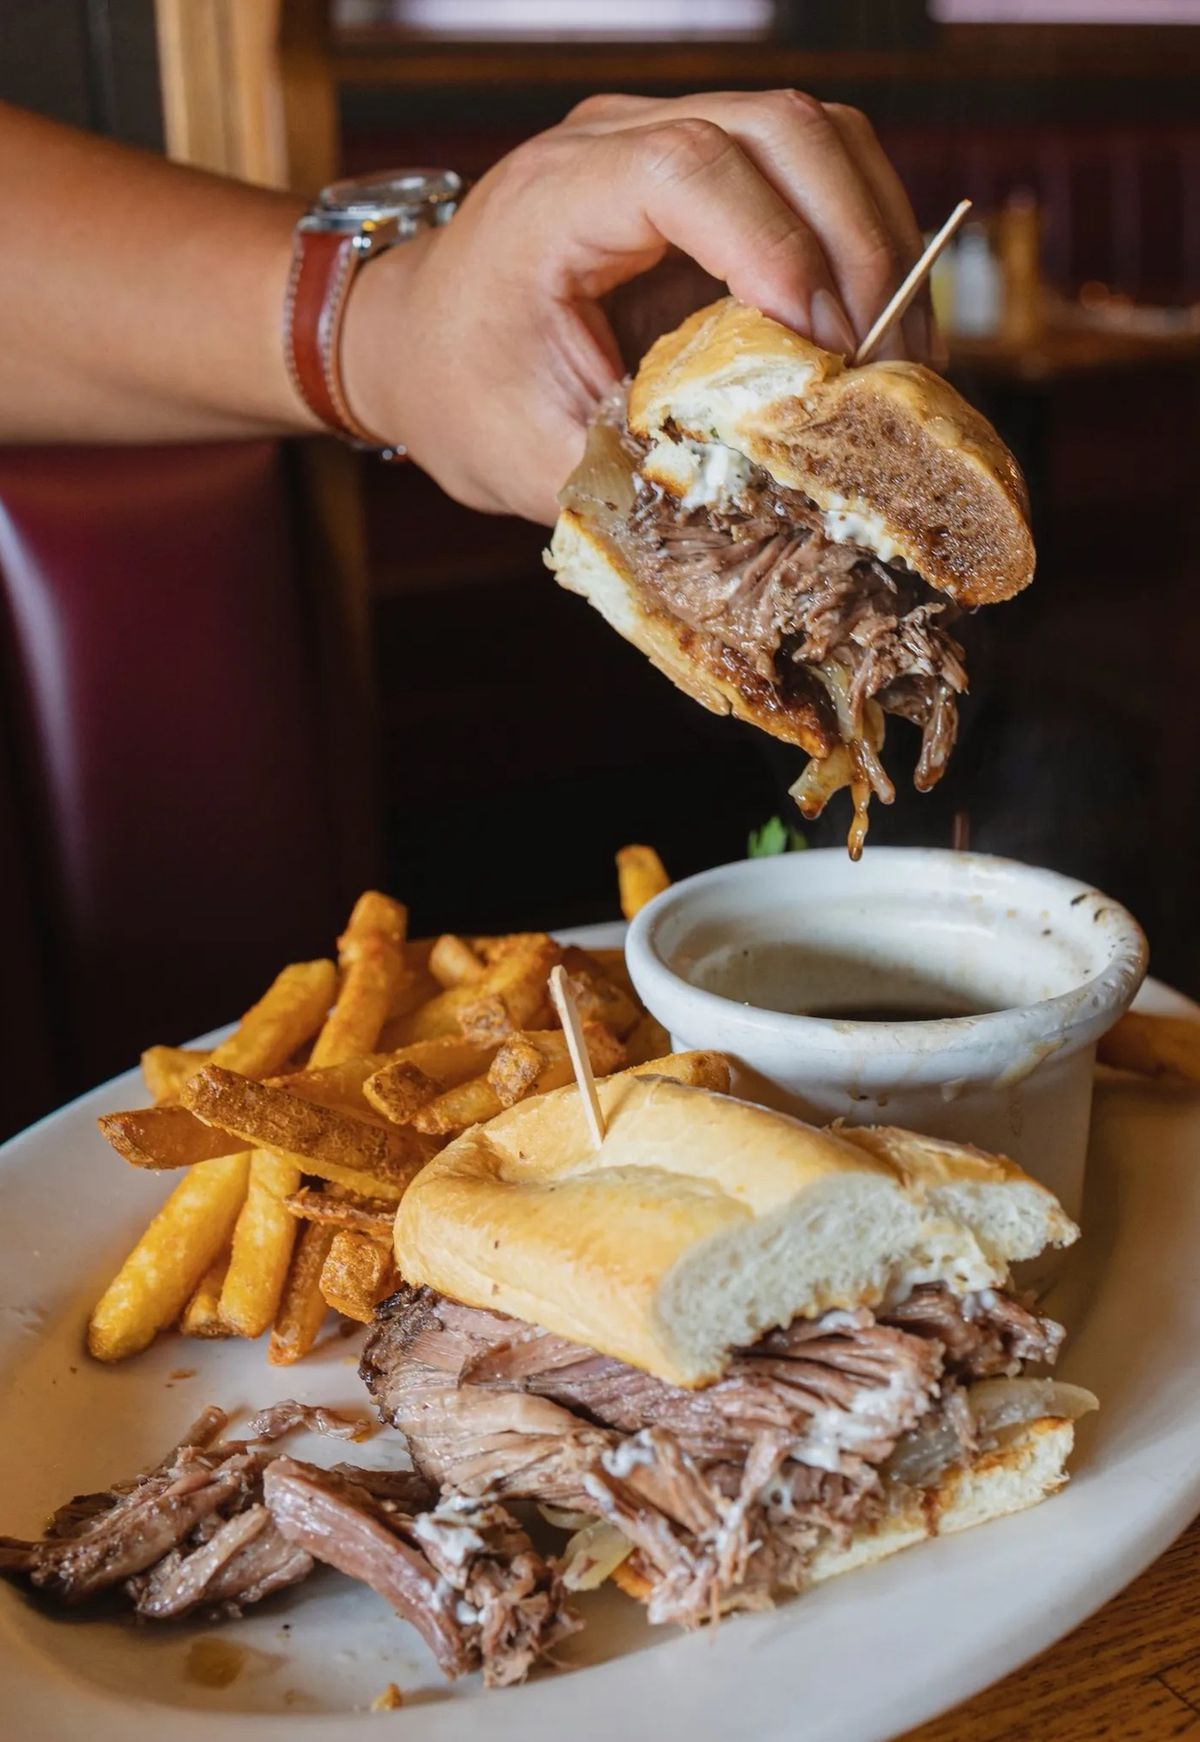 A hand dips a roast beef sandwich into juice.